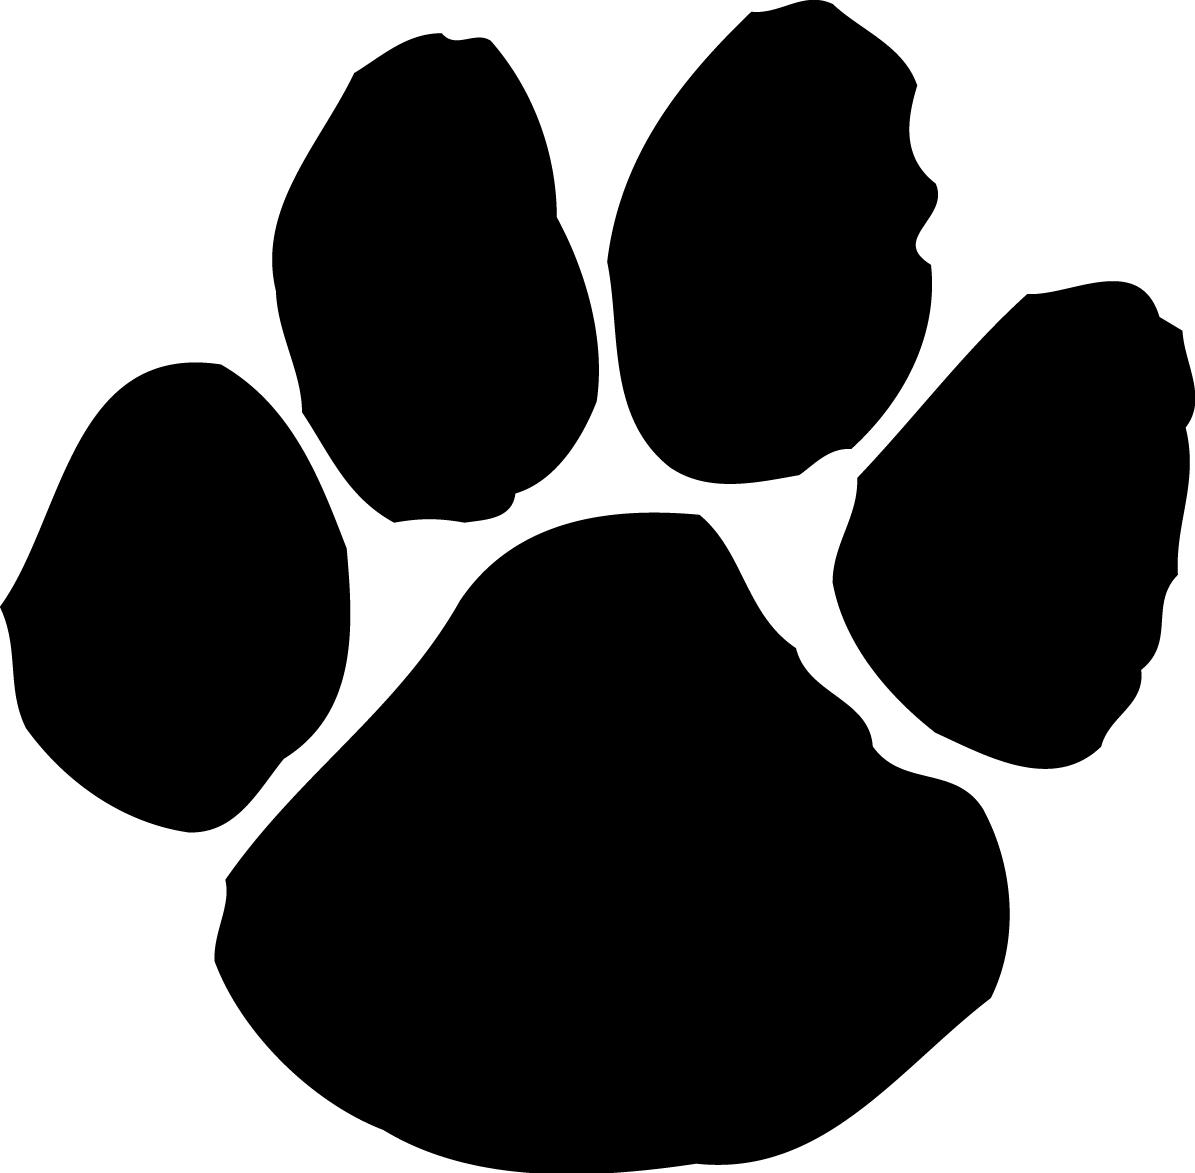 Bulldog paw print clipart 4